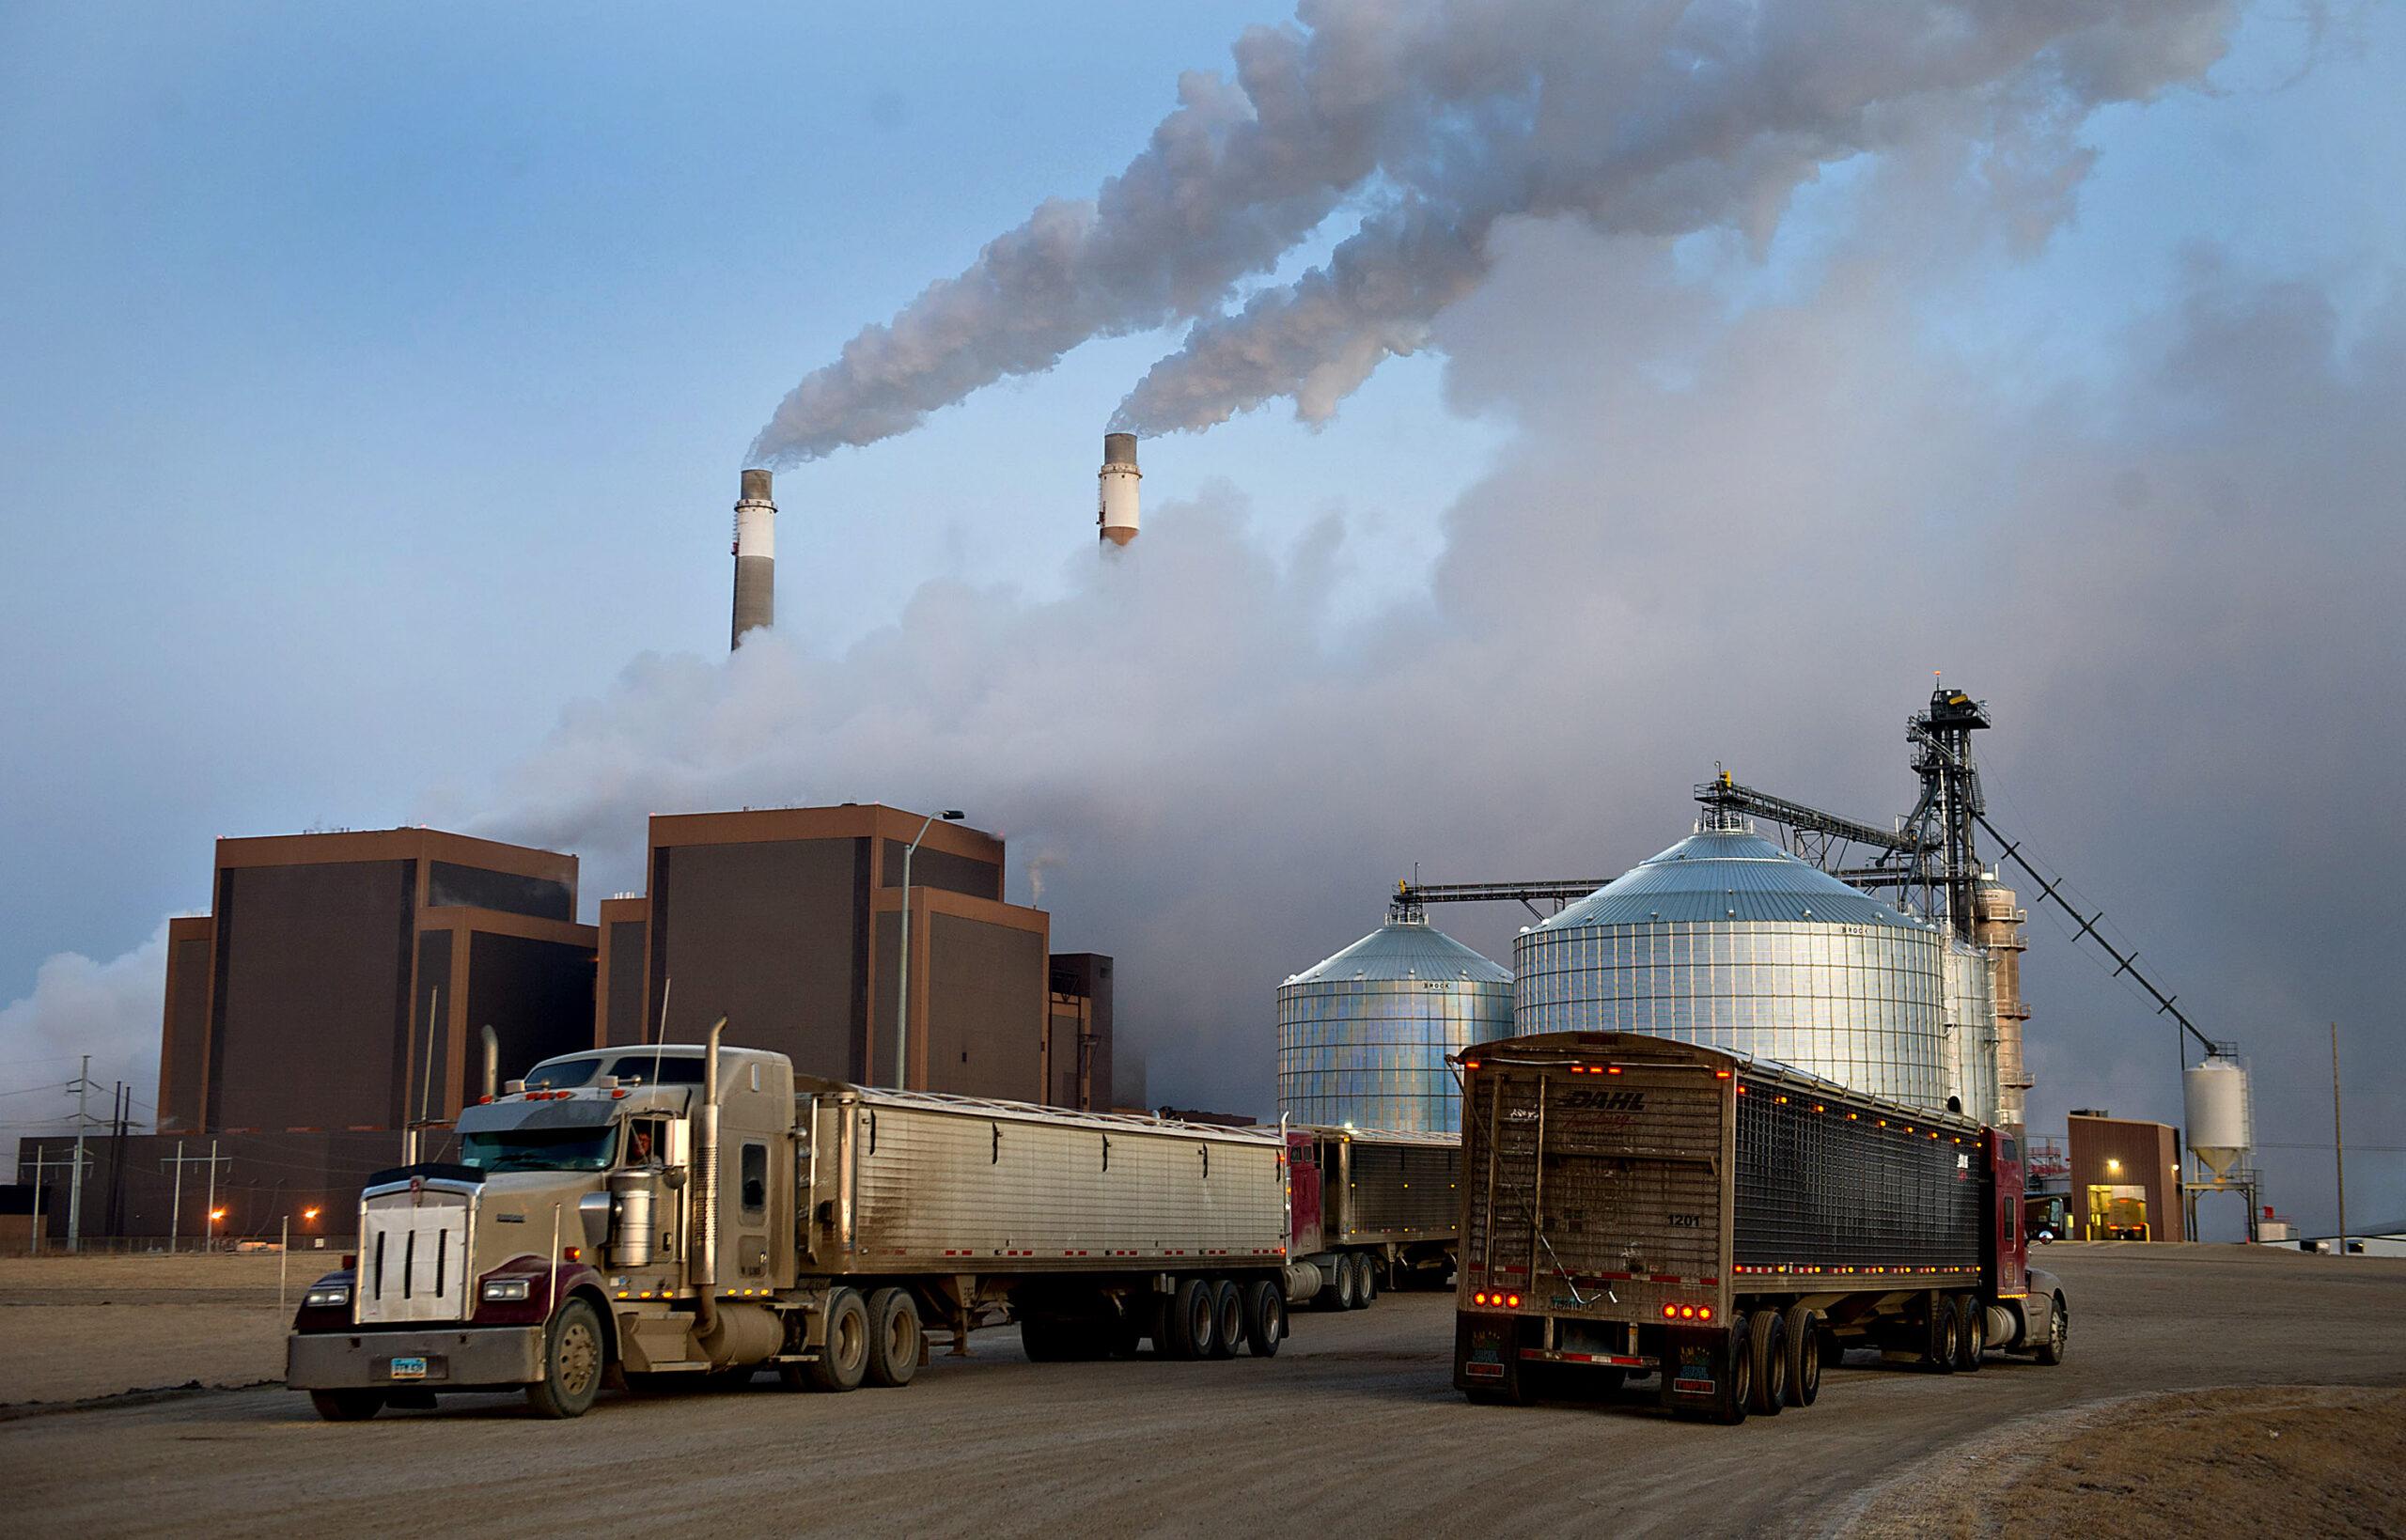 Trucks wait to enter the Great River Energy Blue Flint Ethanol plant in Underwood, North Dakota, on Thursday, Feb. 9, 2012. Credit: Daniel Acker/Bloomberg via Getty Images